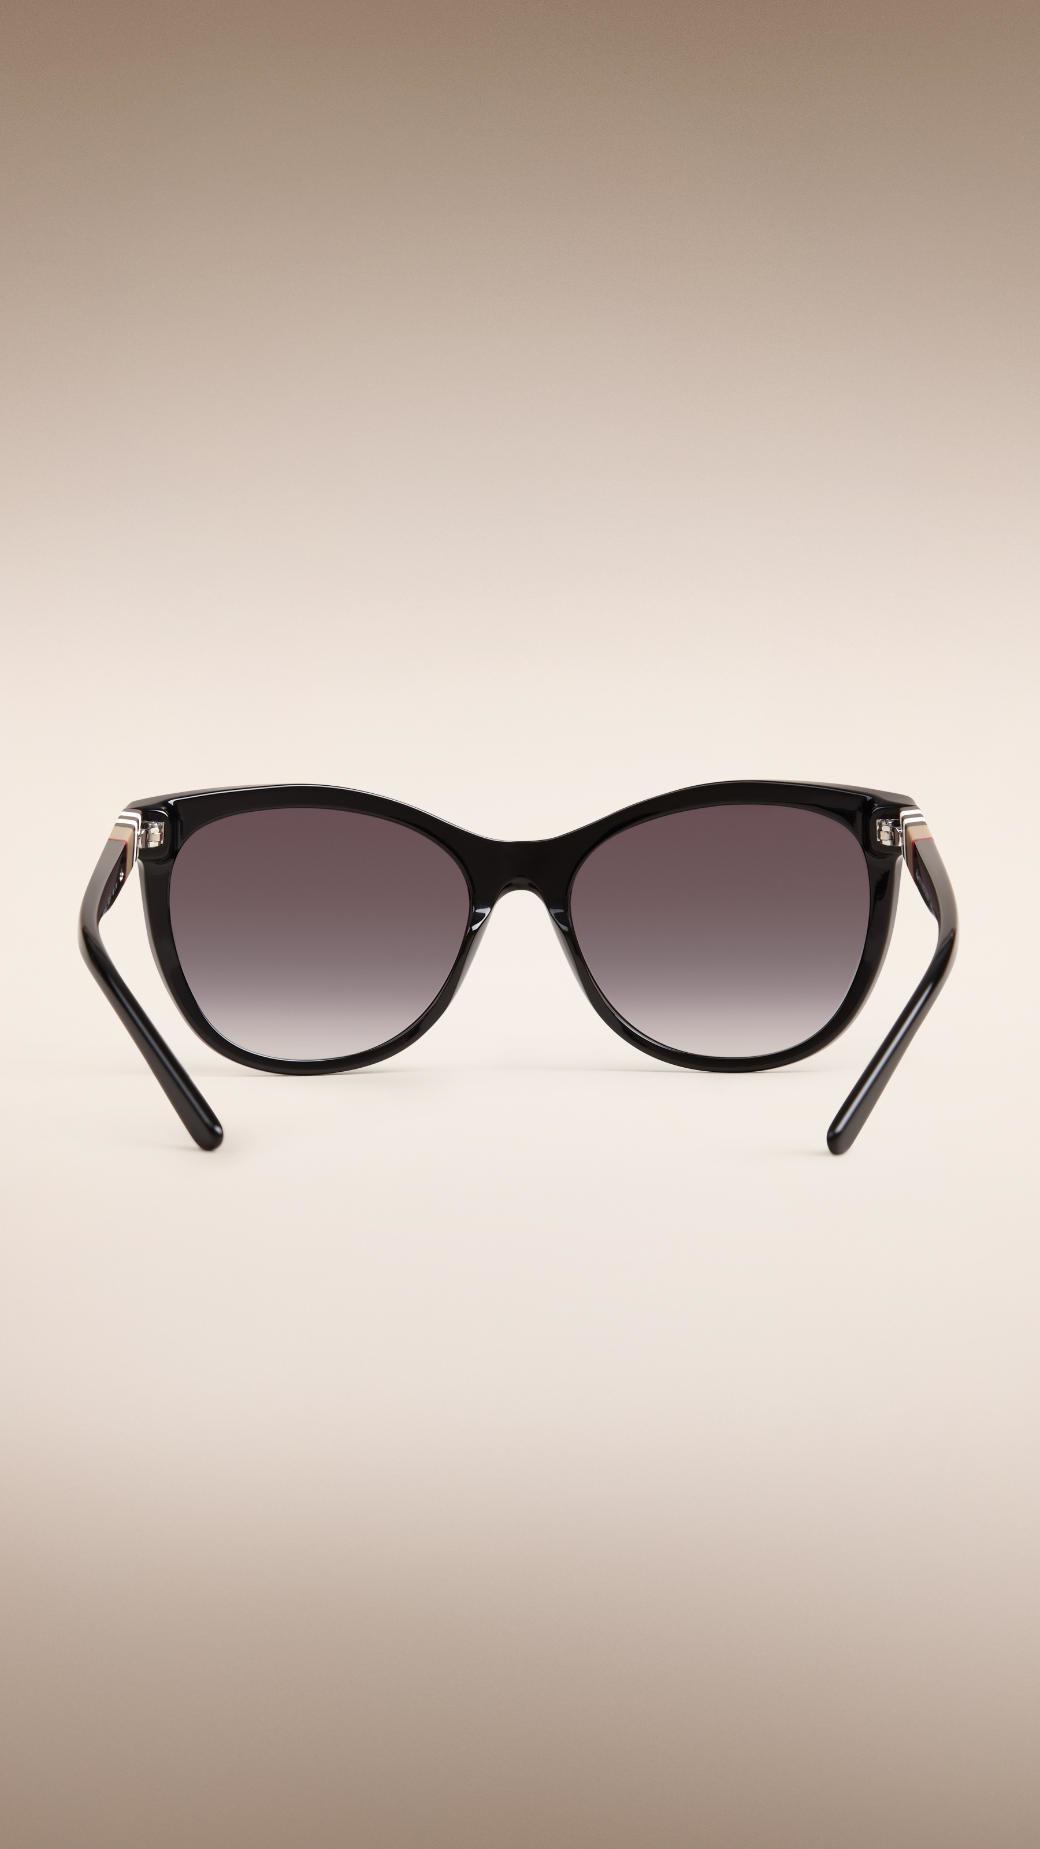 ab9ec3e78e3 Lyst - Burberry Check Detail Cat-eye Sunglasses Black in Black